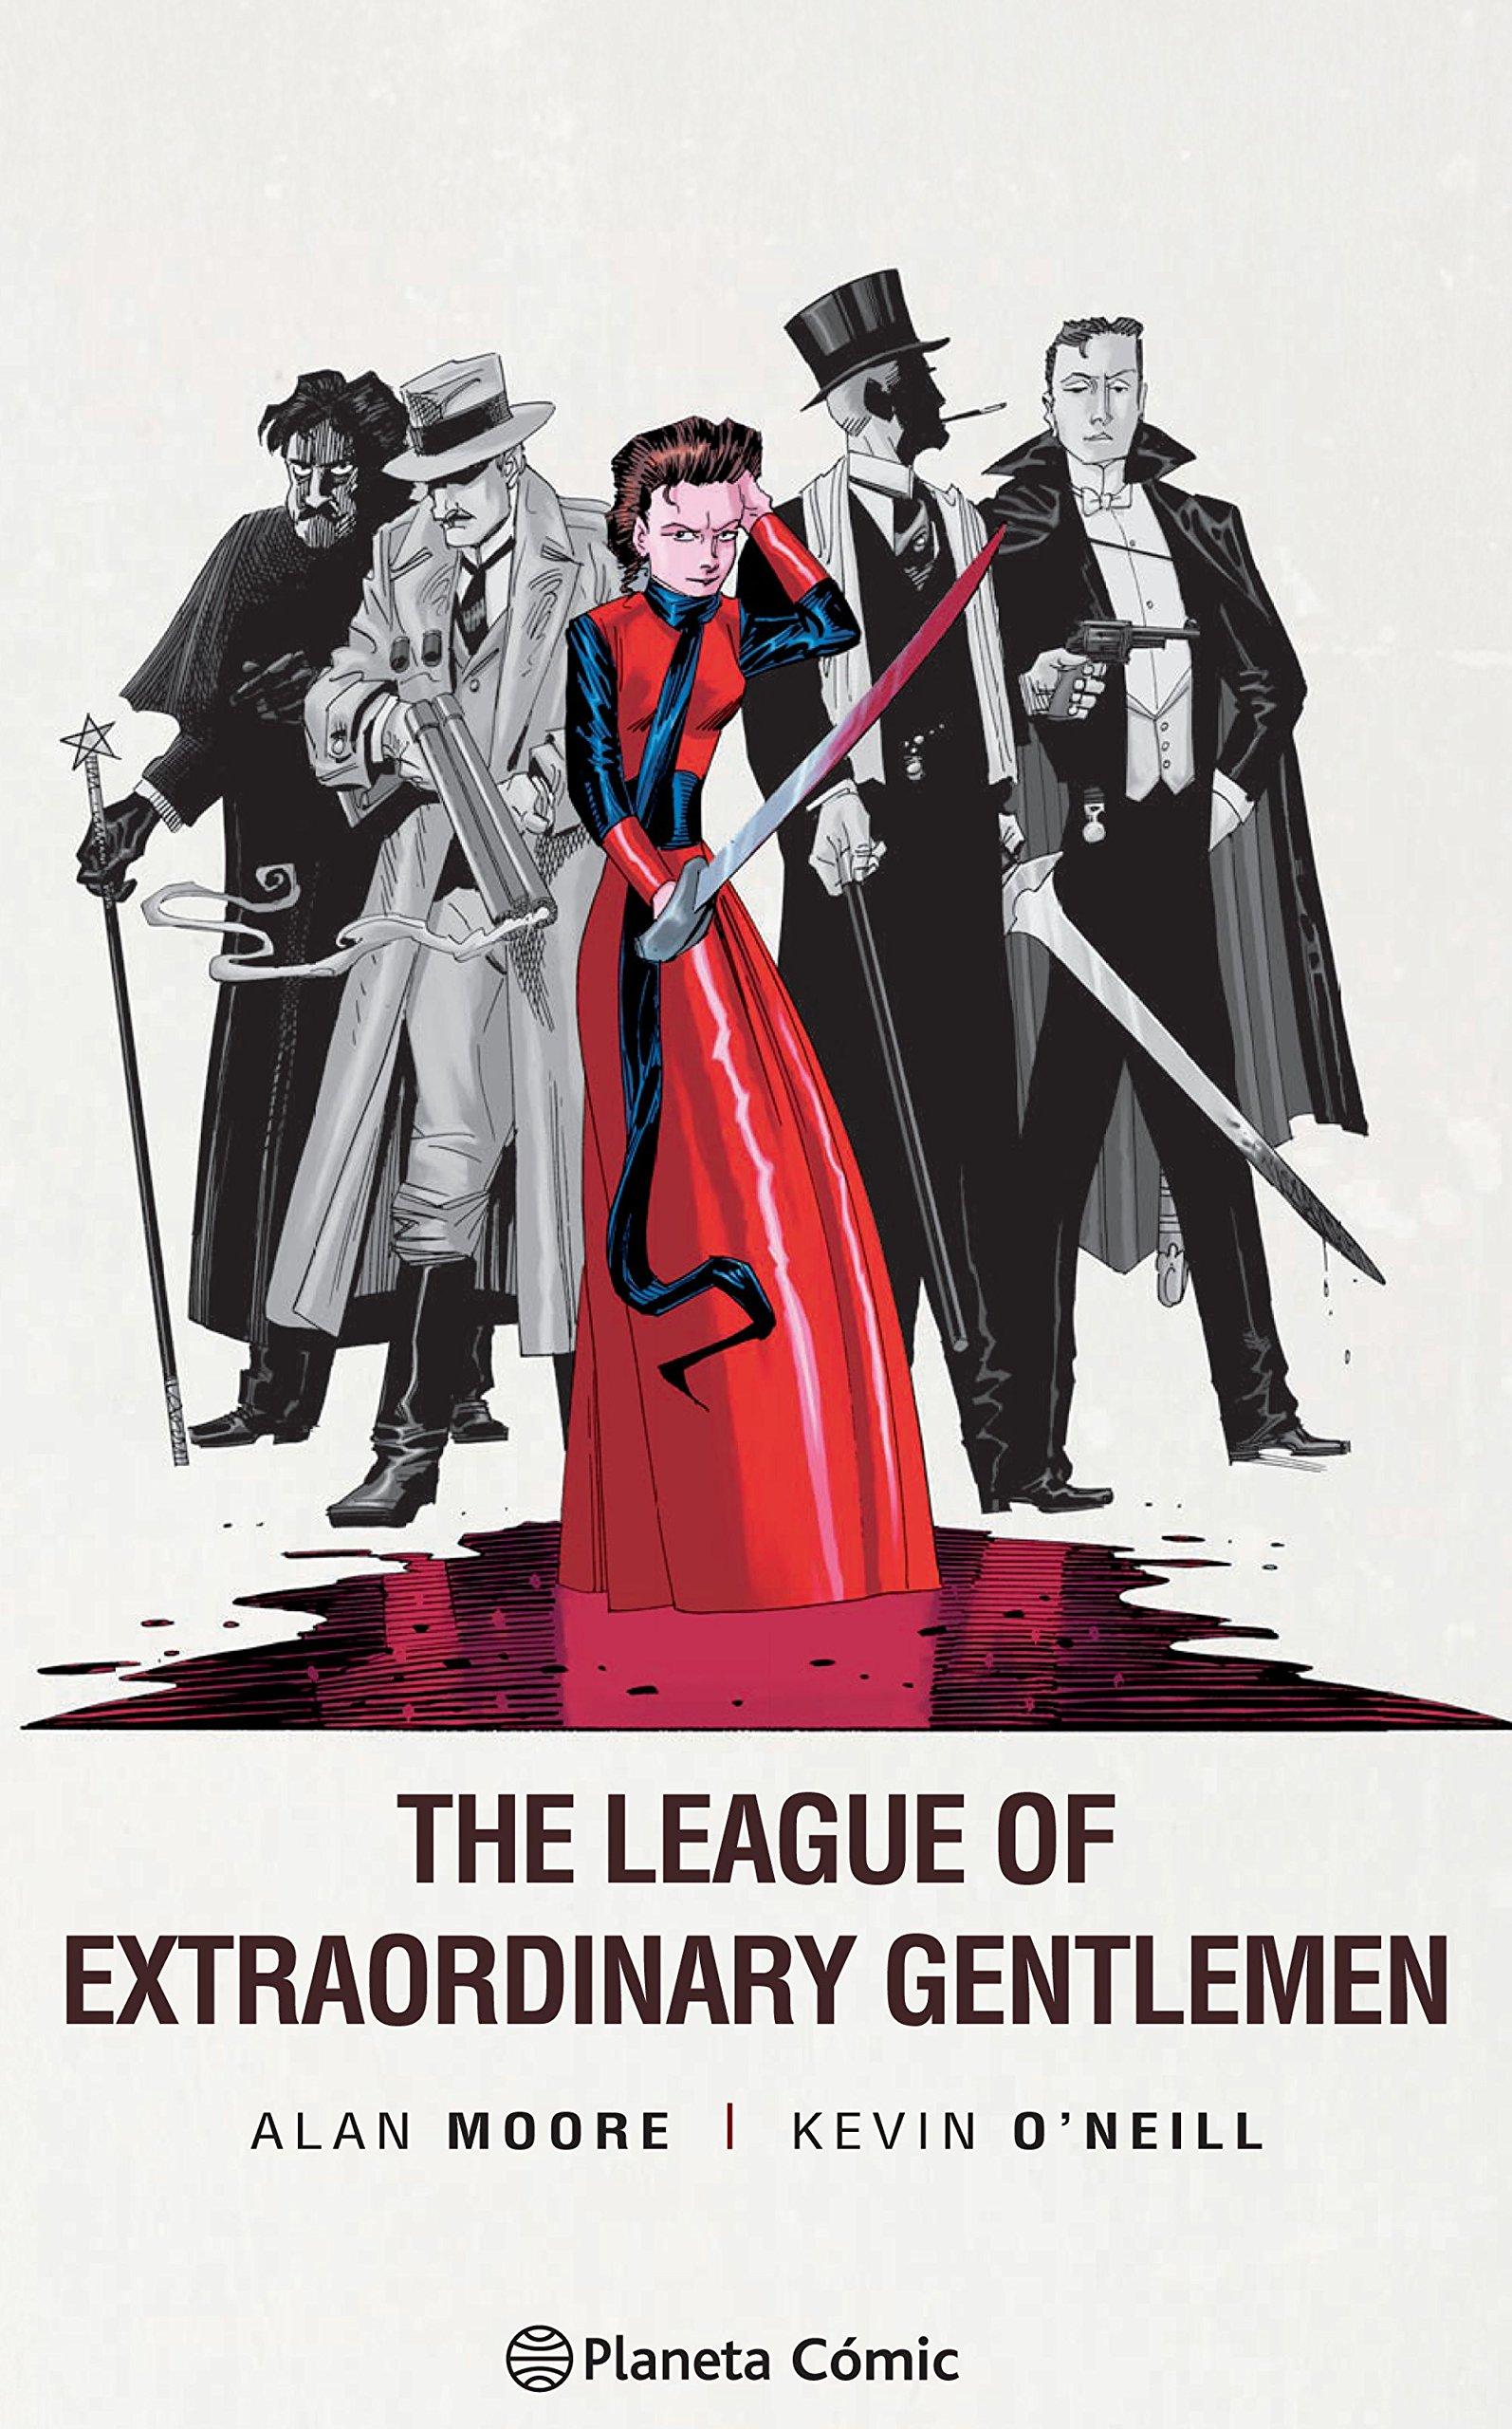 The League of Extraordinary Gentlemen nº 03/03 (edición Trazado) Tapa dura – 17 ene 2017 Alan Moore Kevin O'Neill Diego de los Santos Planeta DeAgostini Cómics